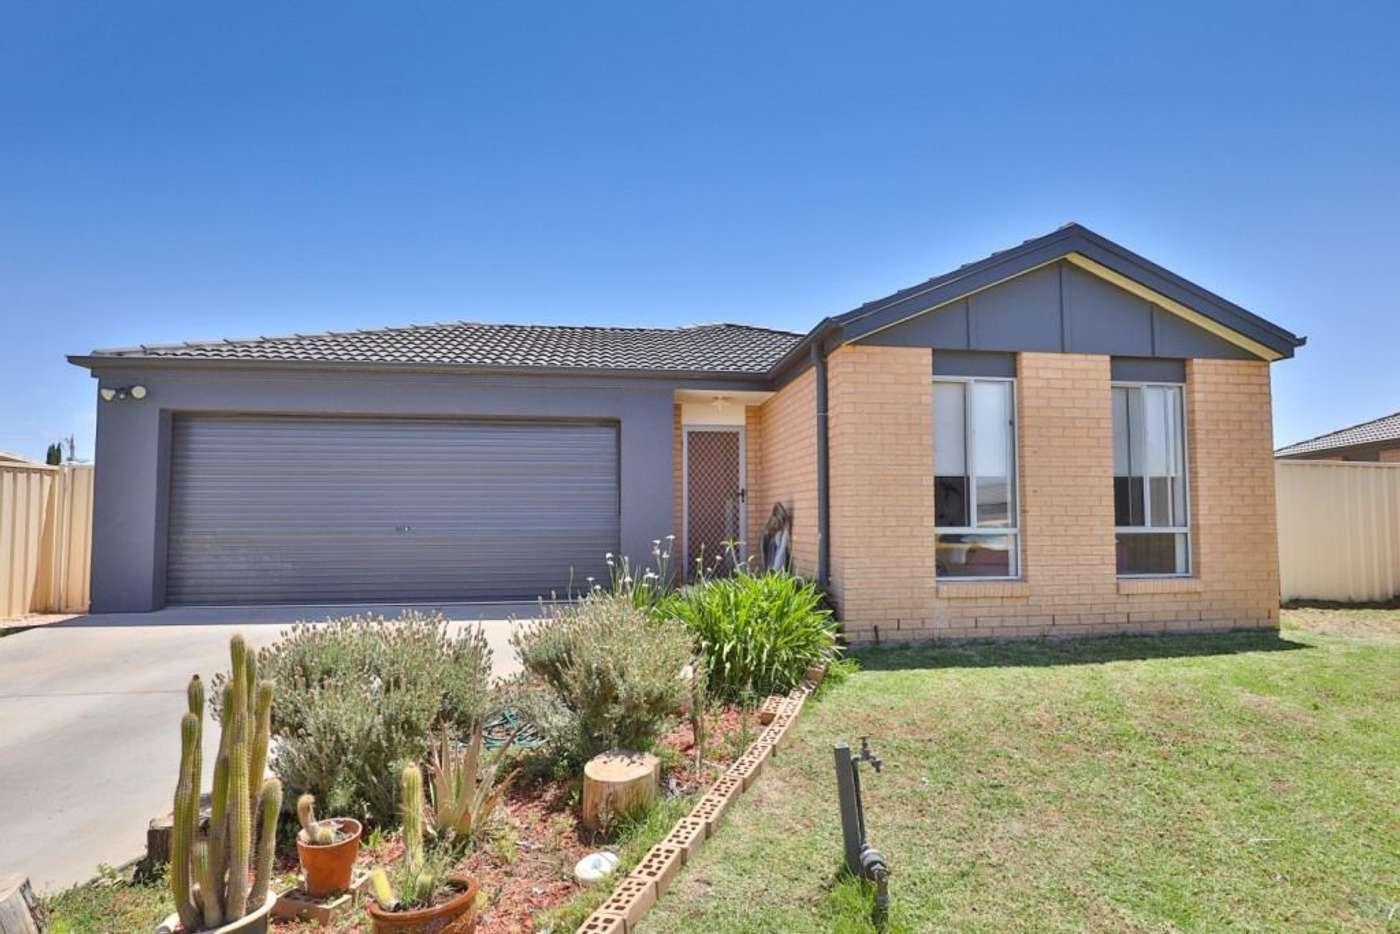 Main view of Homely house listing, 12 Reisling Court, Mildura VIC 3500